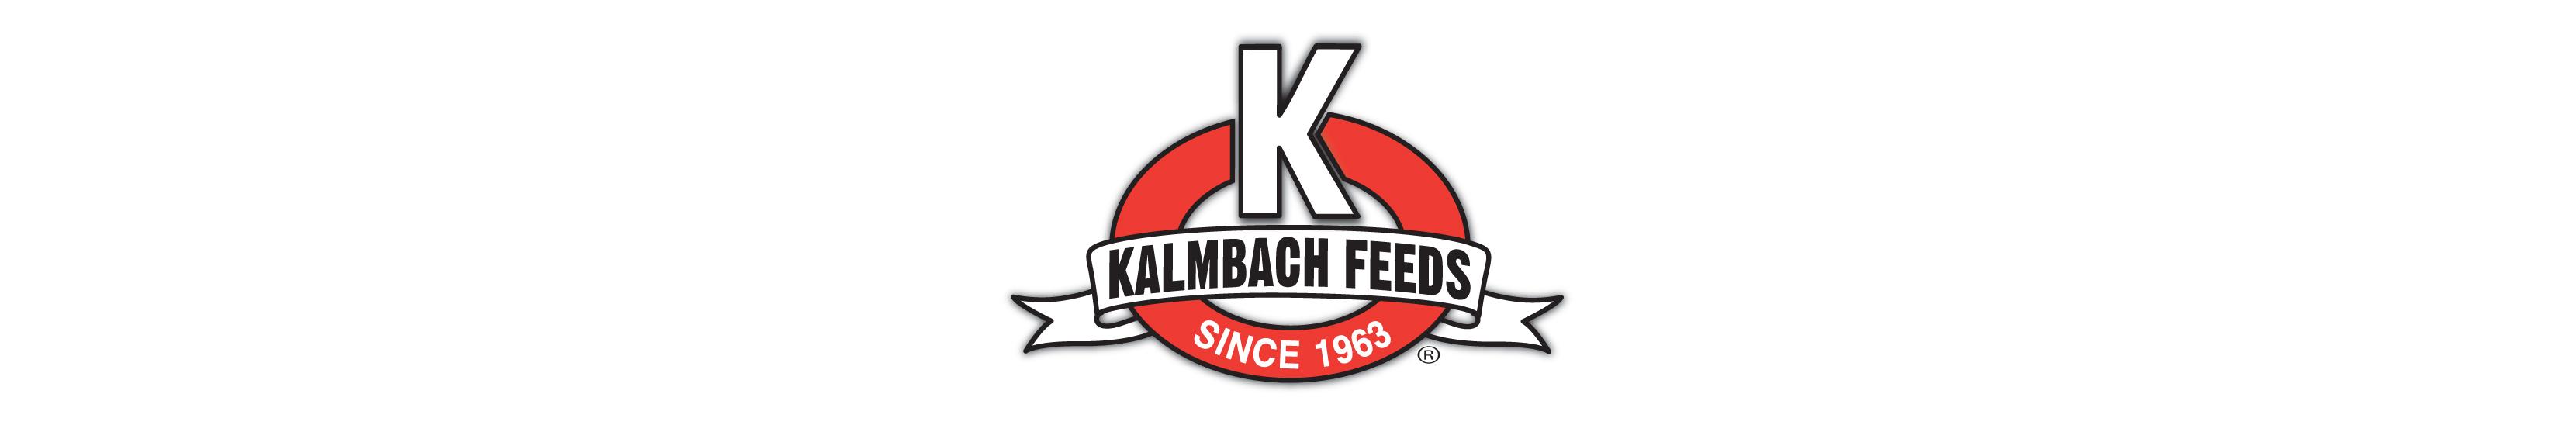 Kalmbach Feeds, Inc.